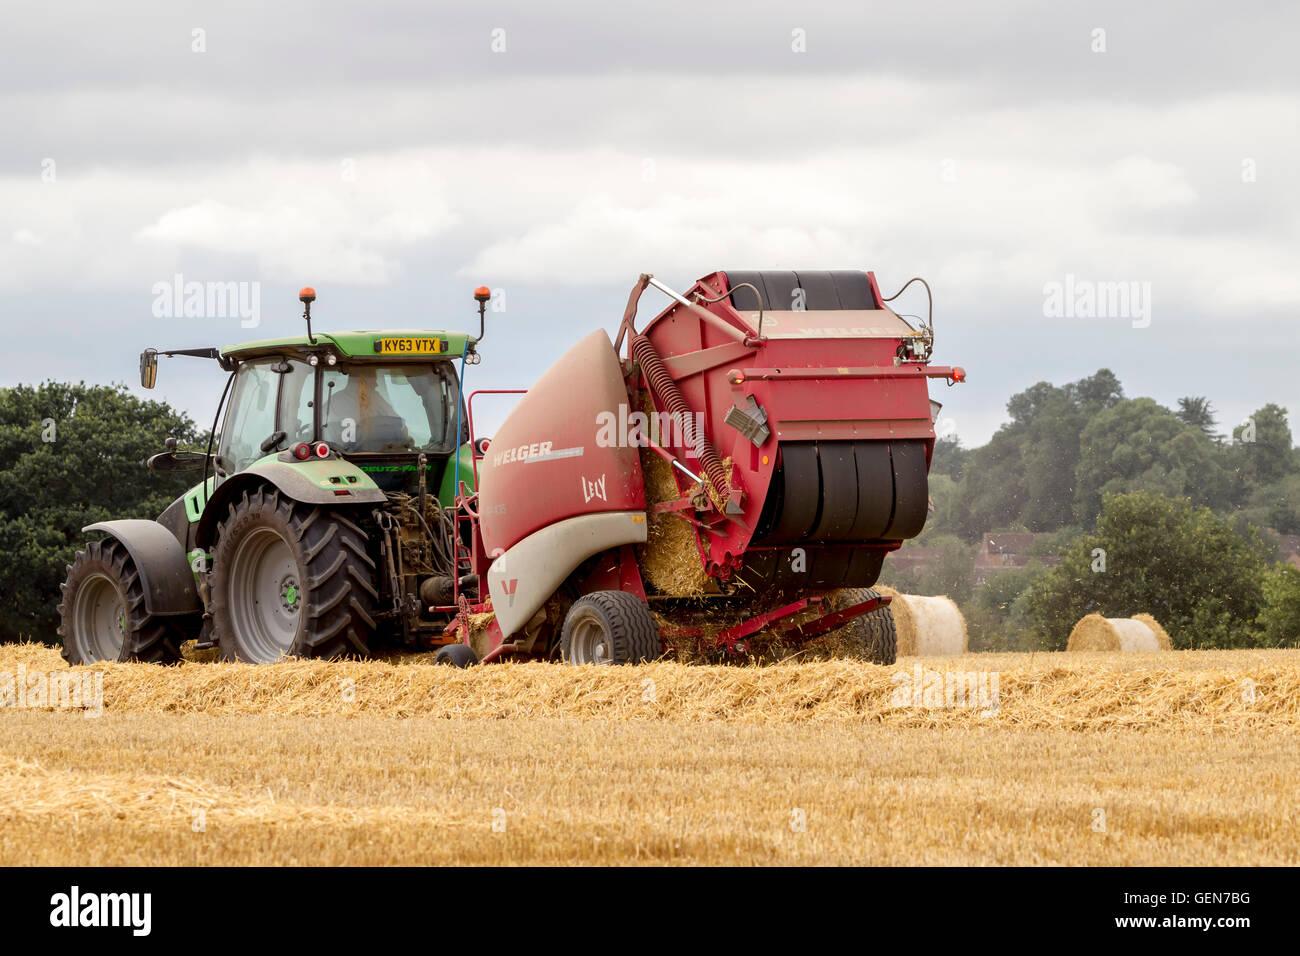 Baler Machine Stockfotos & Baler Machine Bilder - Alamy